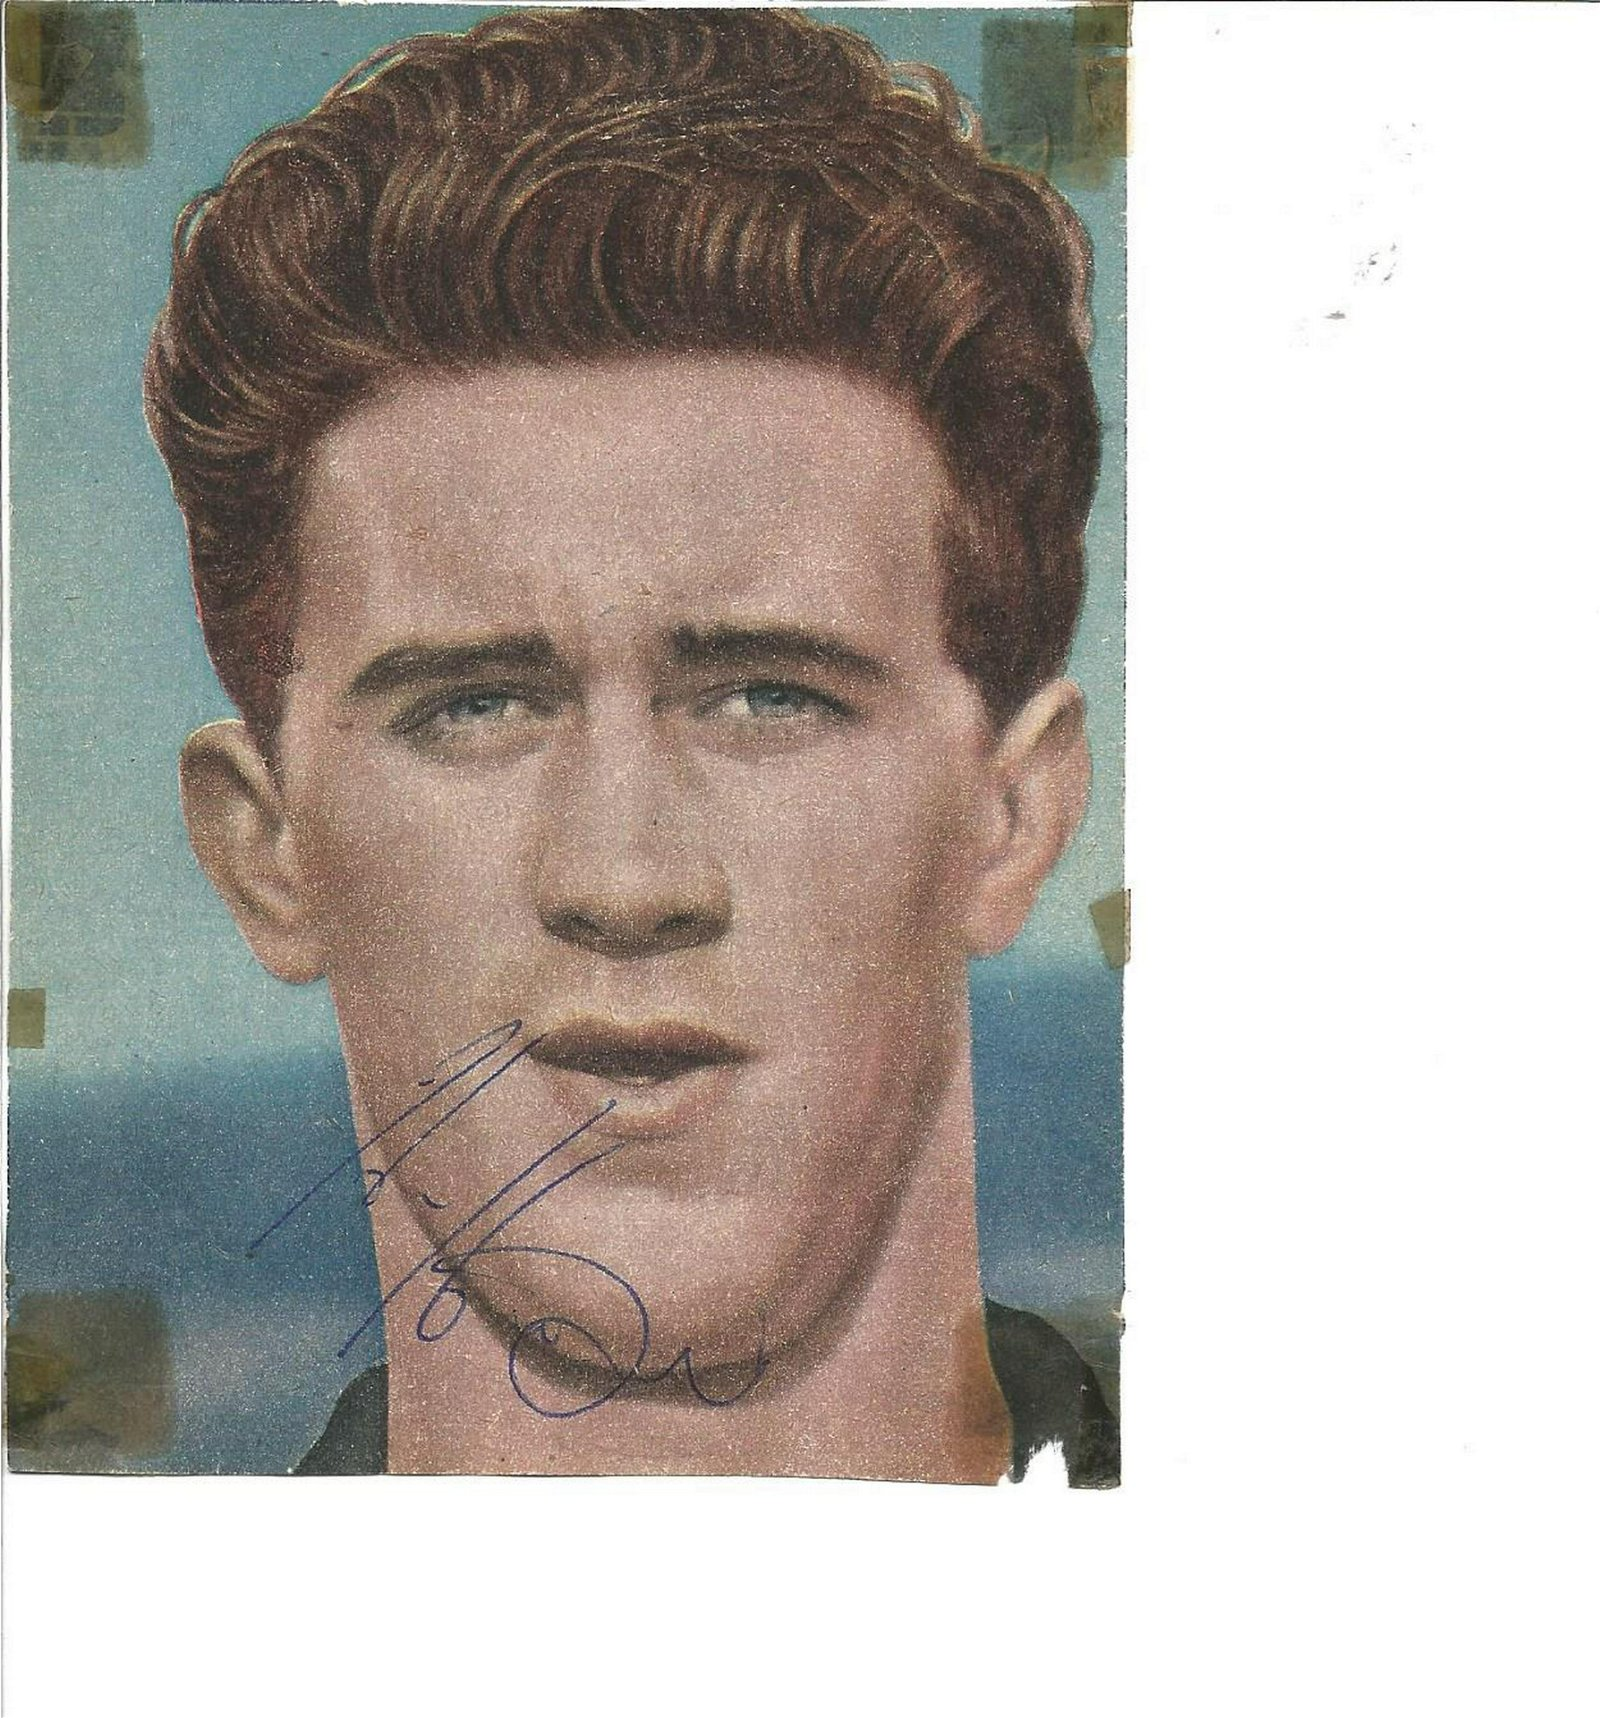 Football Legends Harry Hooper 6x4 signed colour